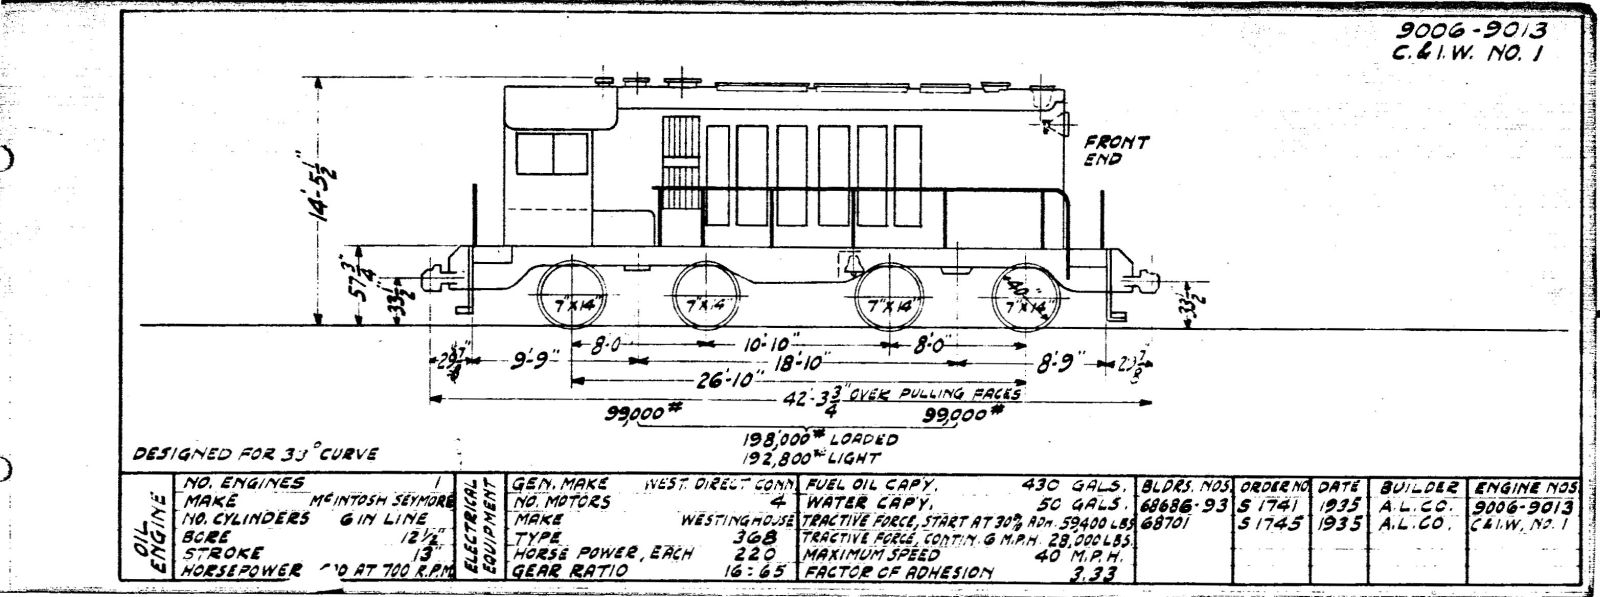 Illinois Central 1937 Locomotive Diagrams